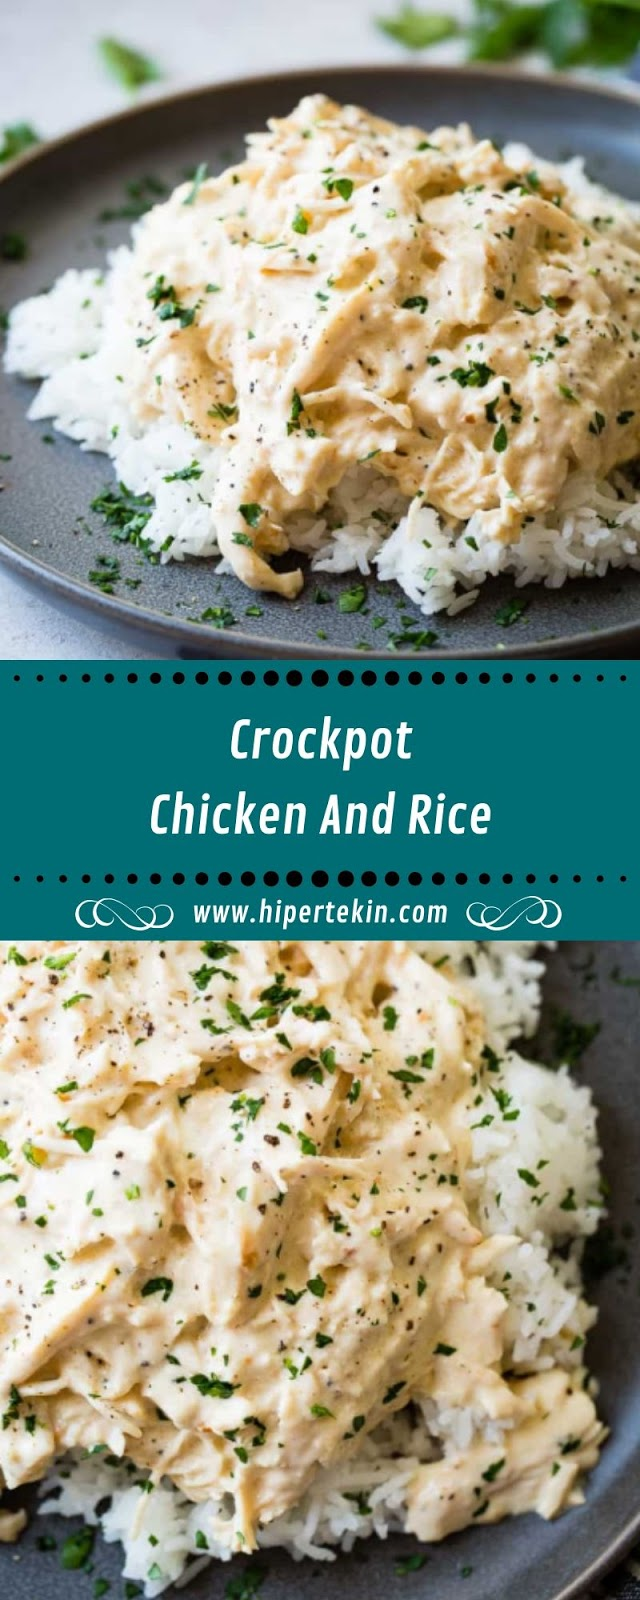 CROCKPOT CHICKEN AND RICE